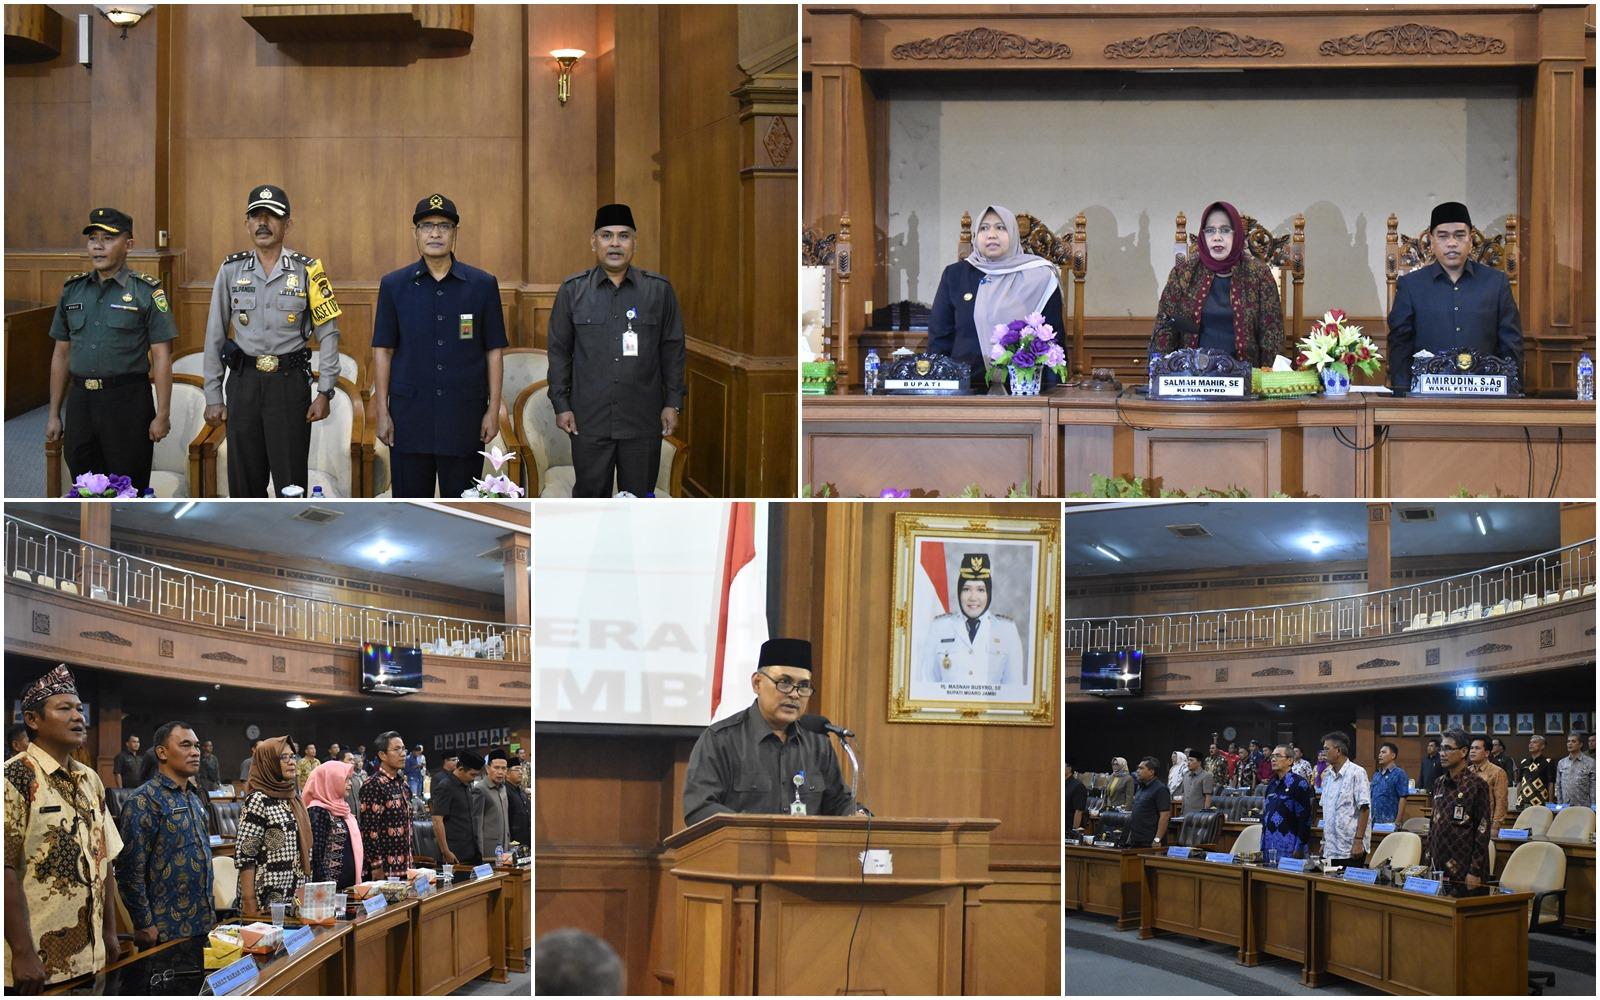 H. Buhri Pimpin Do'a Rapat Paripurna DPRD, kamis (7/2/19)